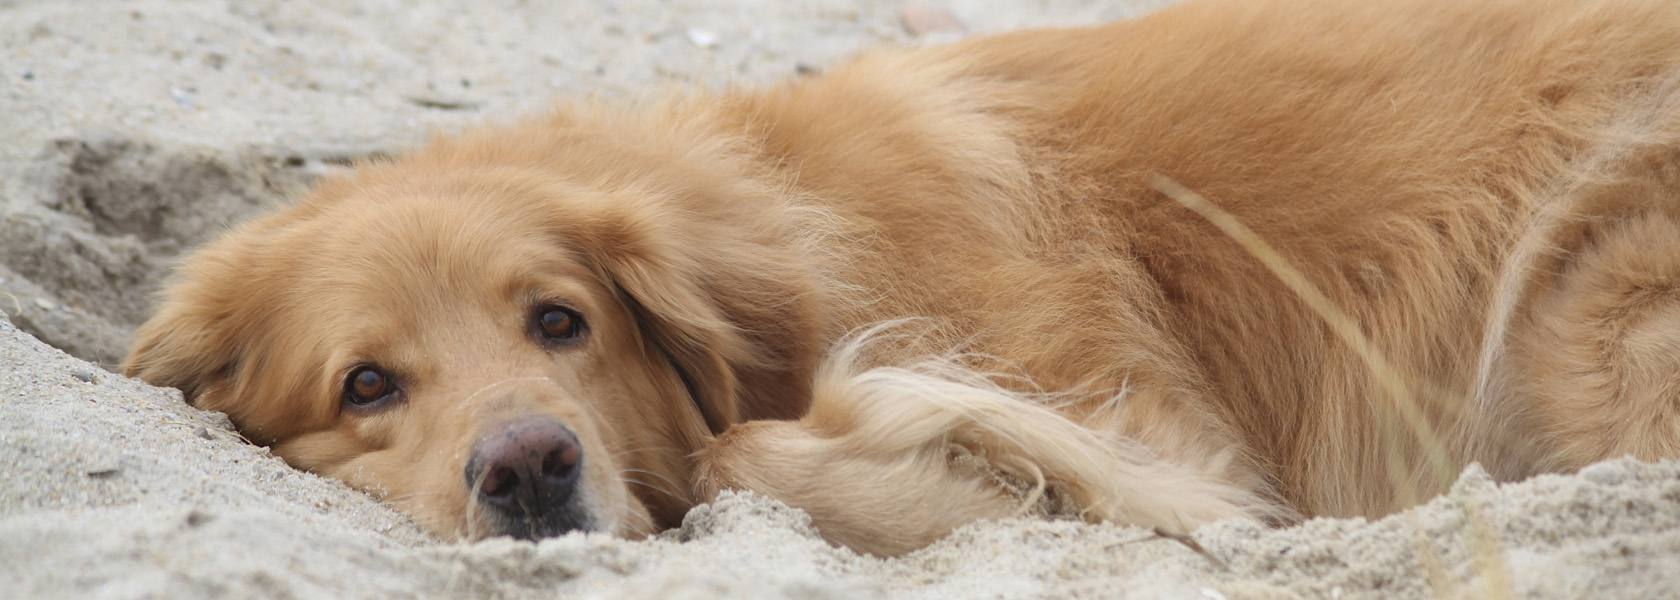 Hund am Strand, © Sven Vietense - Fotolia.com